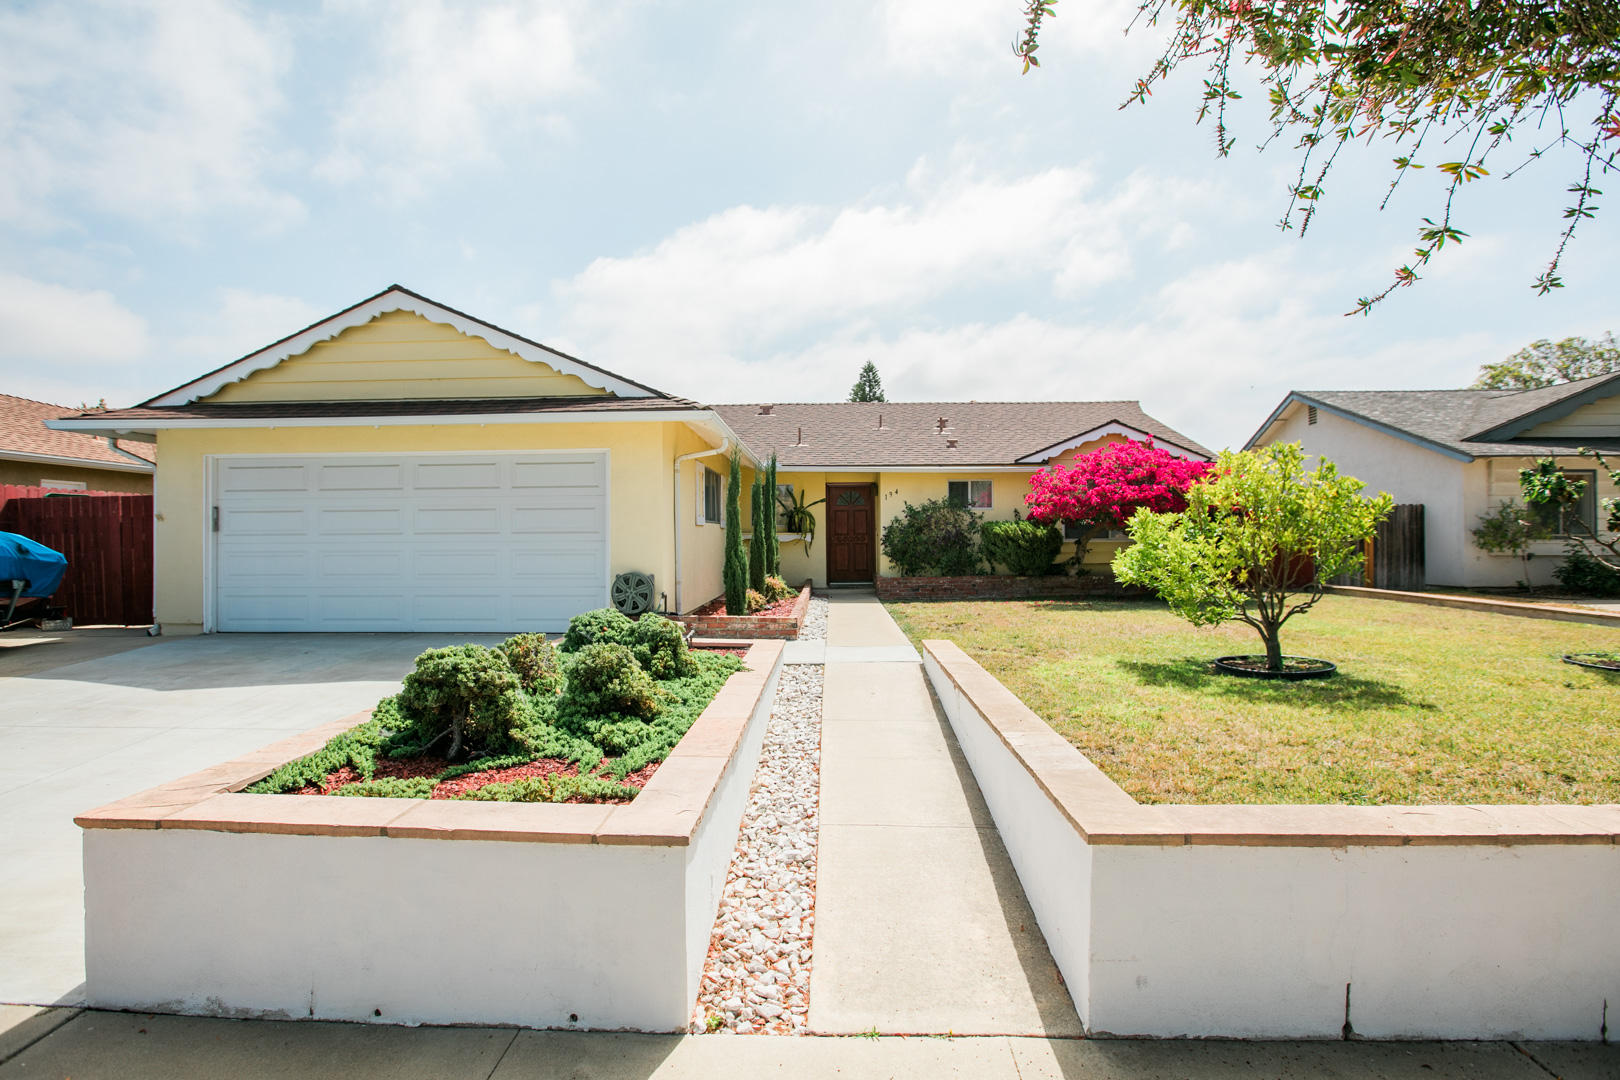 Property photo for 194 Salisbury Ave Goleta, California 93117 - 16-2350